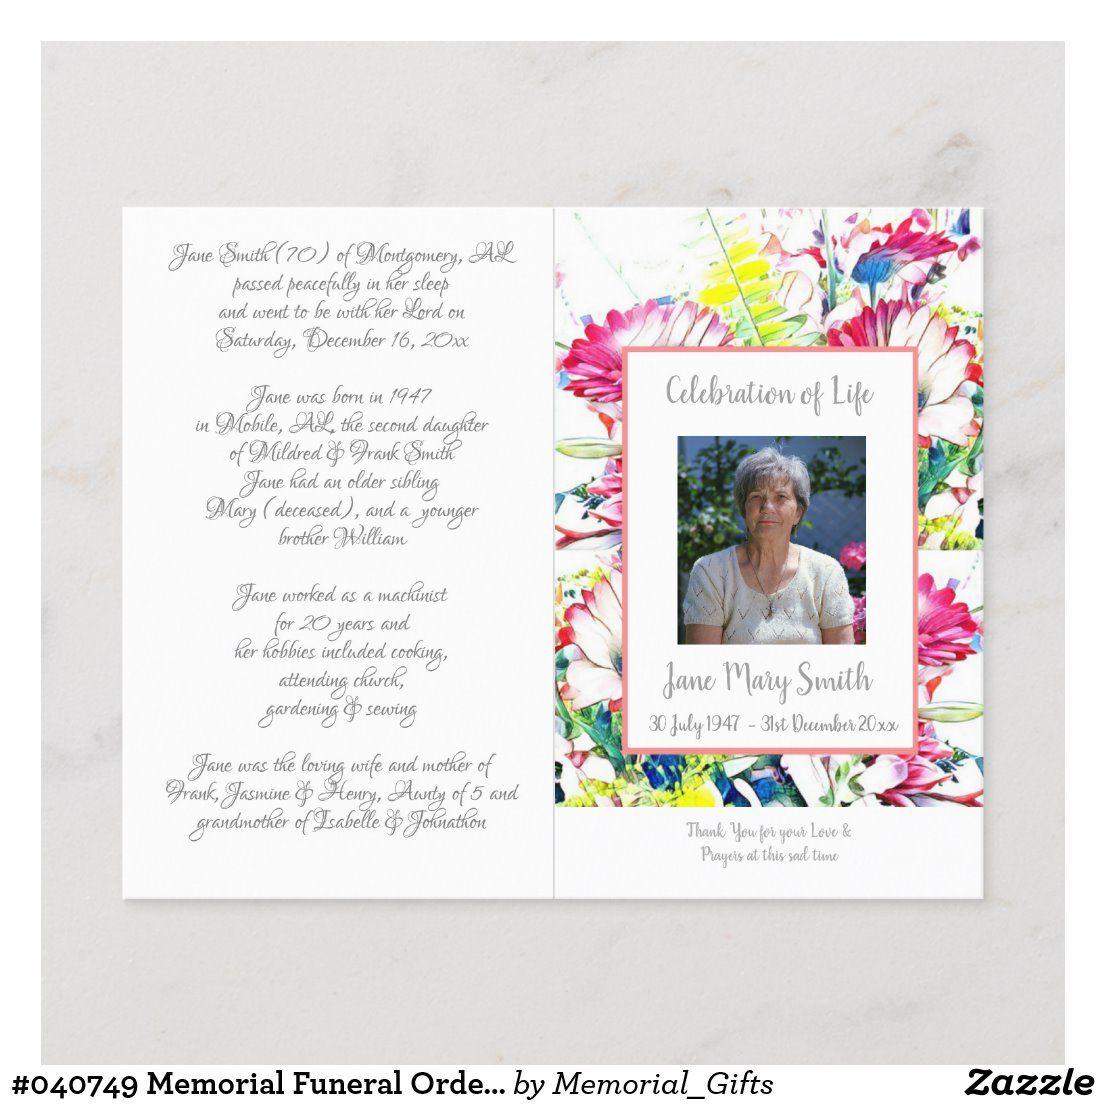 040749 Memorial Funeral Order of Service Program Zazzle